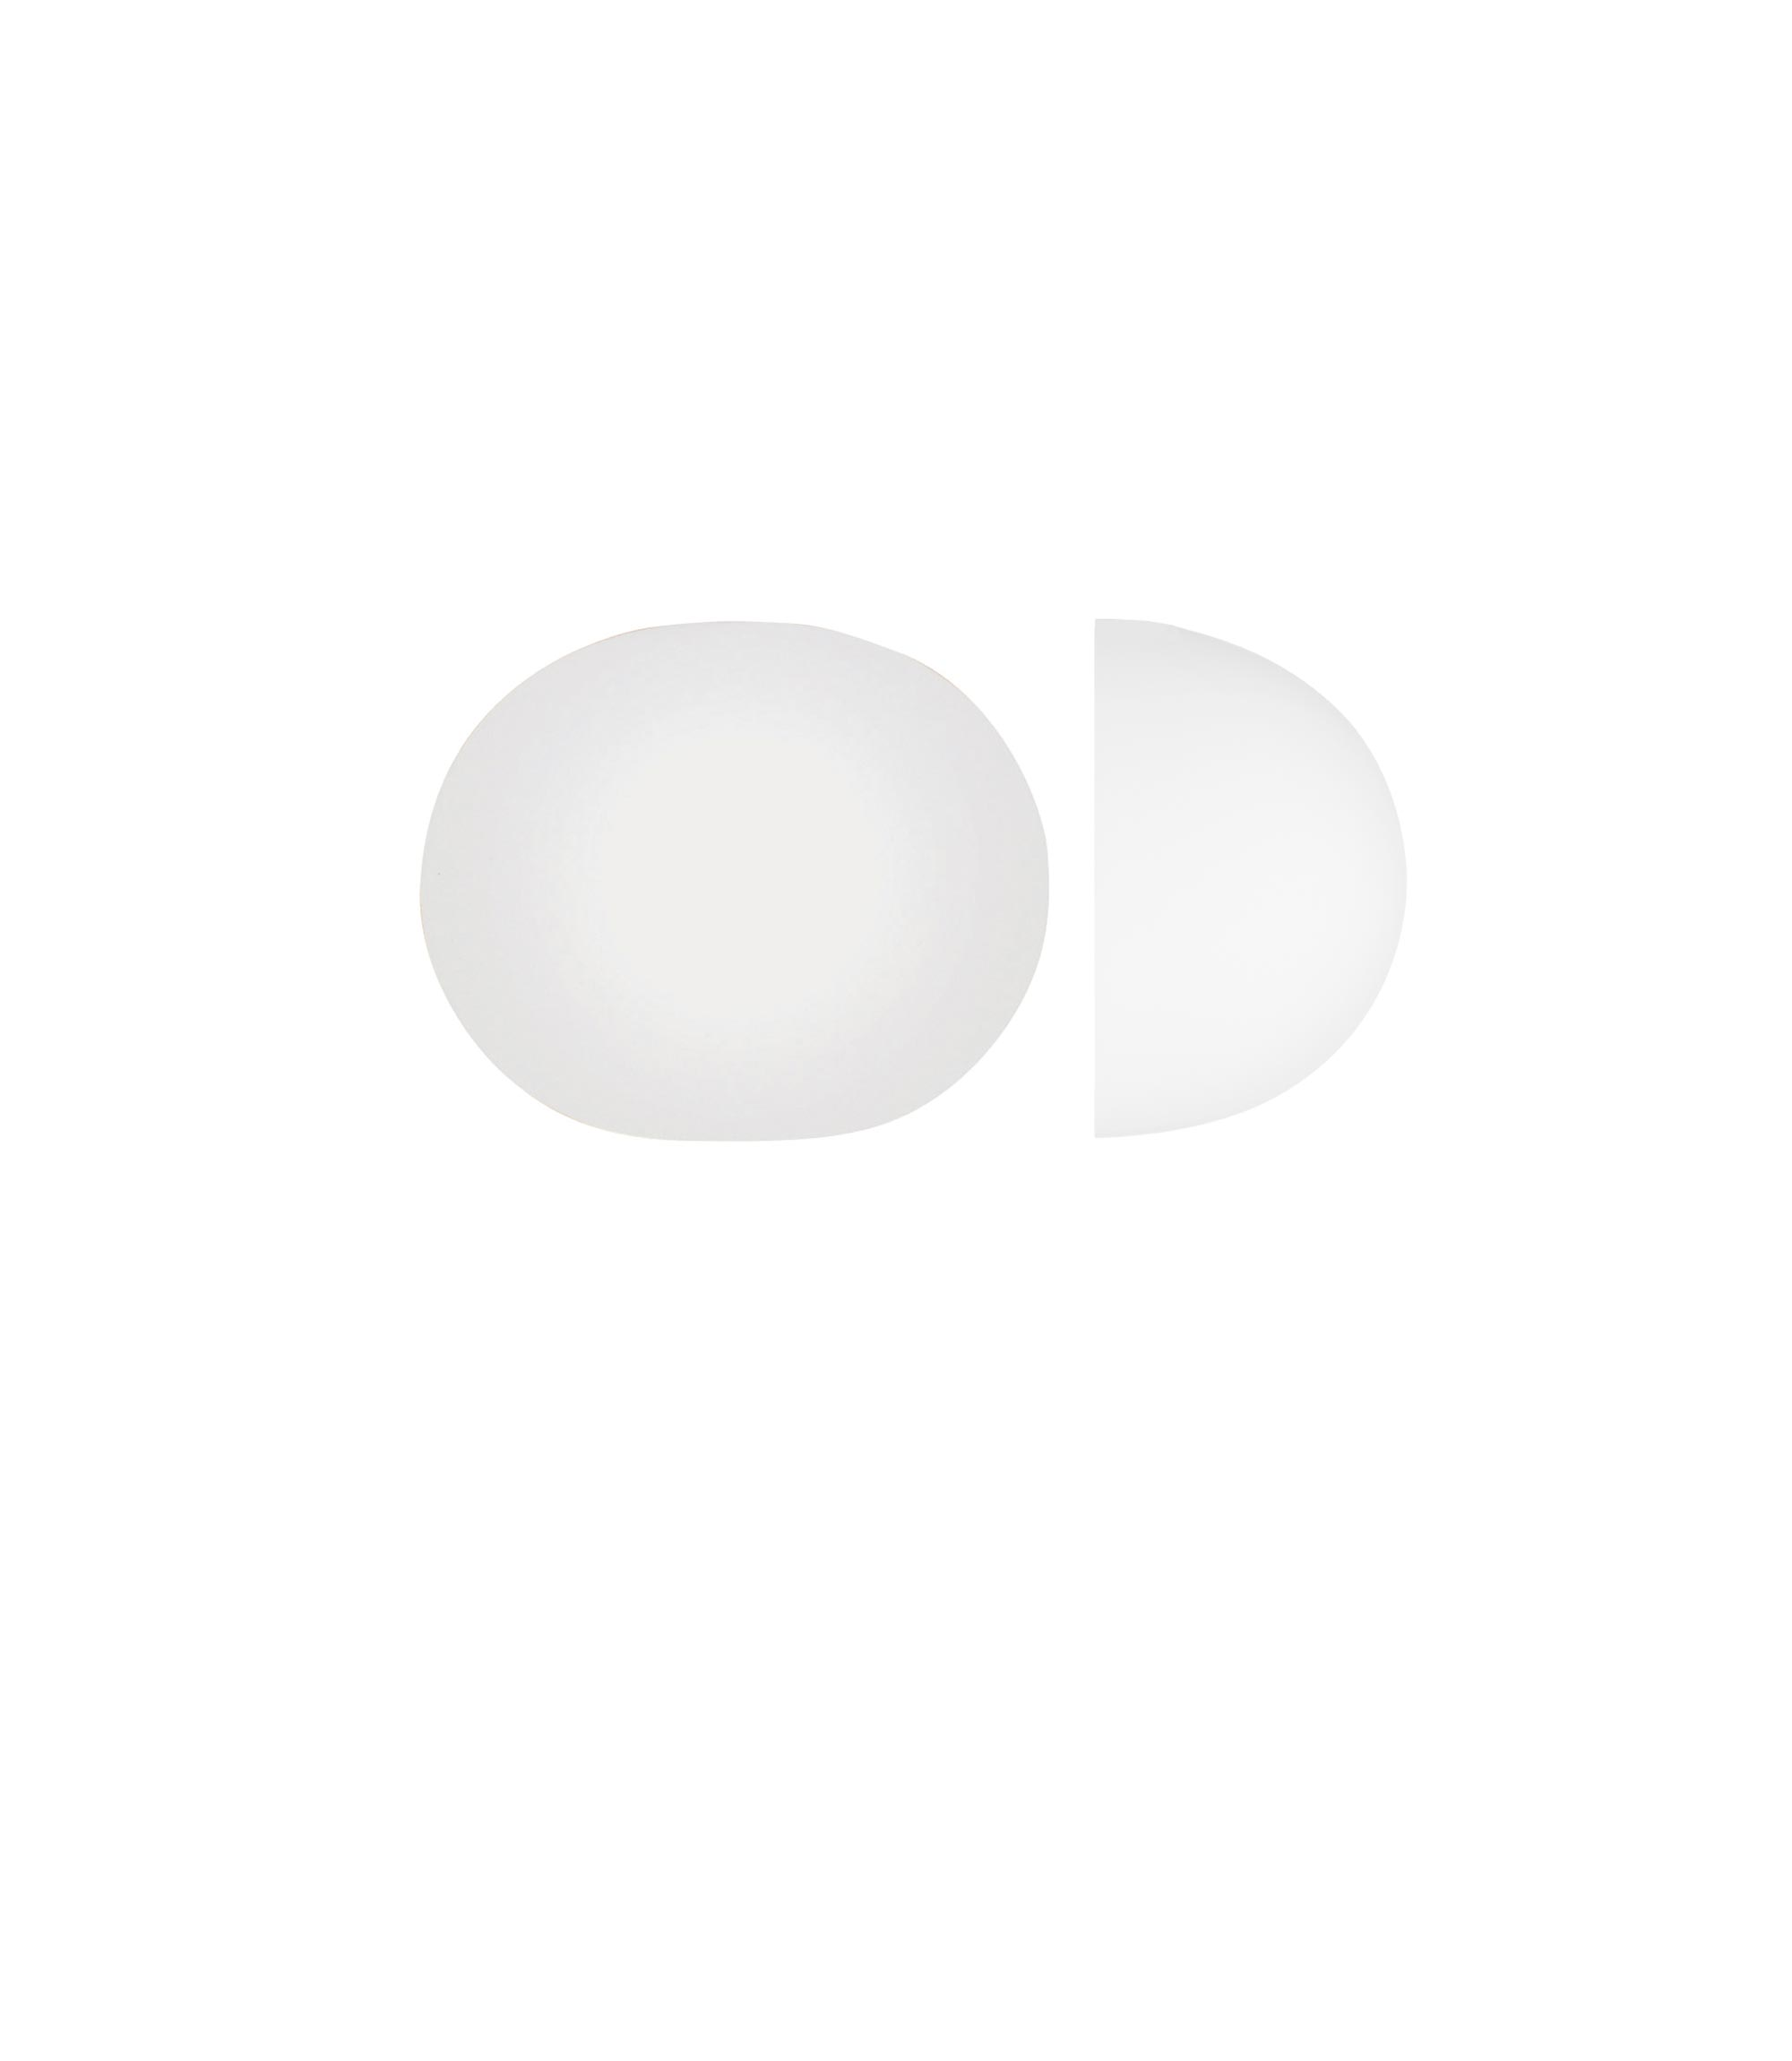 Glo ball wall morrison flos F3022000 product still life big